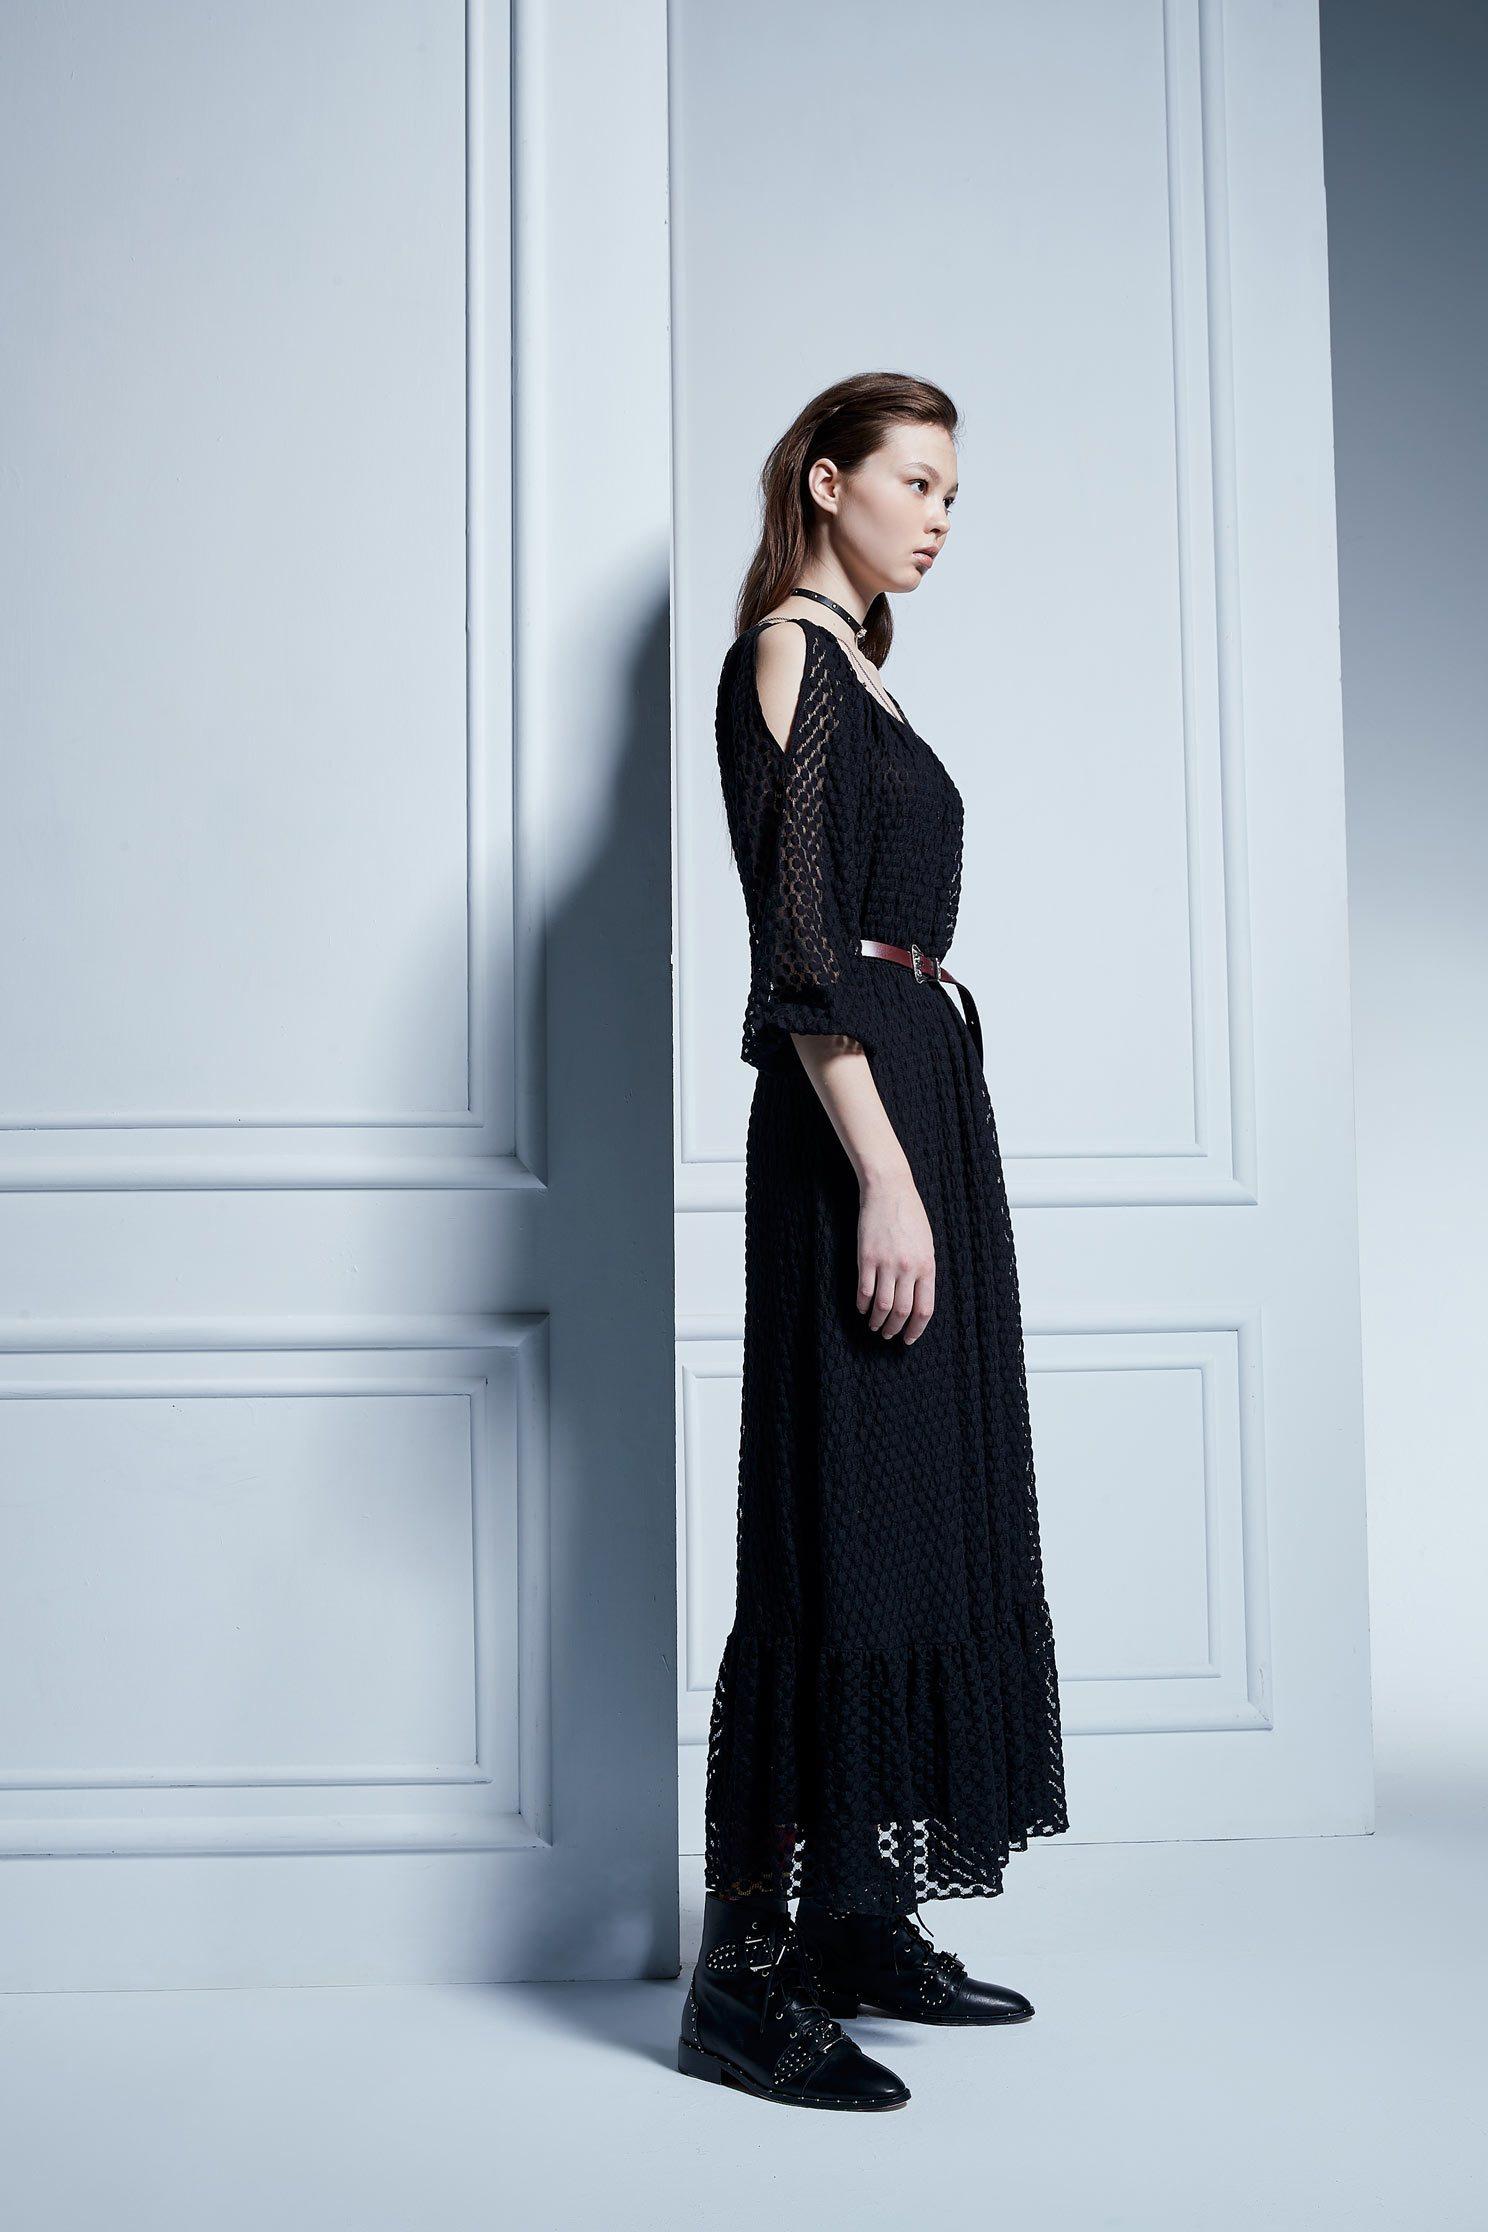 dot dress WITH CUT-OUT SHOULDERS,U-neck dress,Cocktail Dress,Lace,Lace Dress,透膚洋裝,長袖洋裝,Black dress